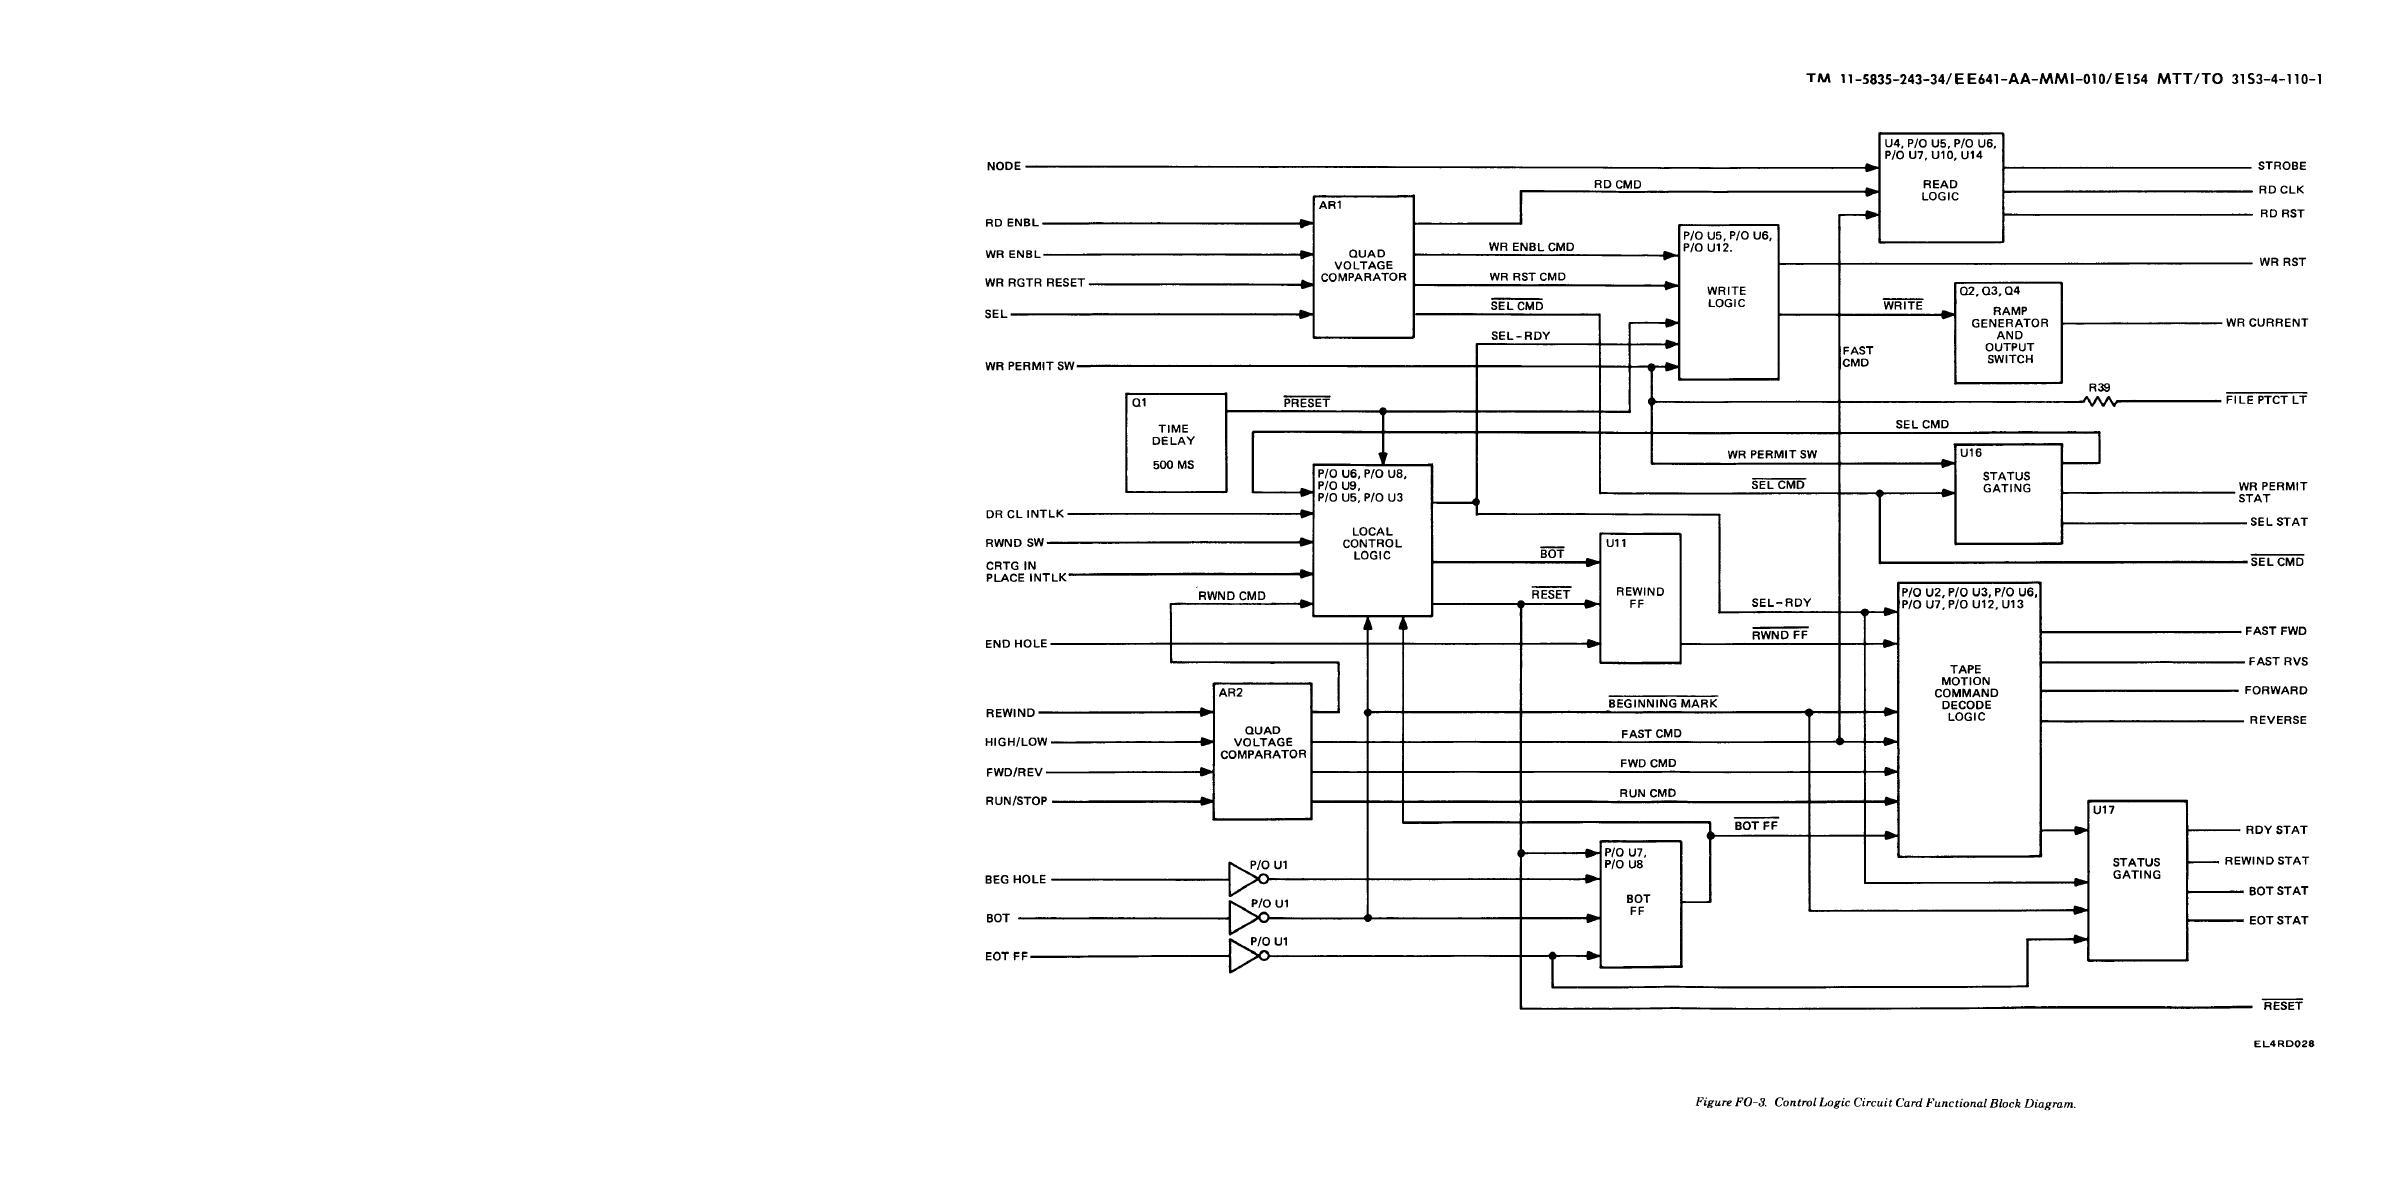 Logic Circuit Page 3 : Digital Circuits :: Next.gr